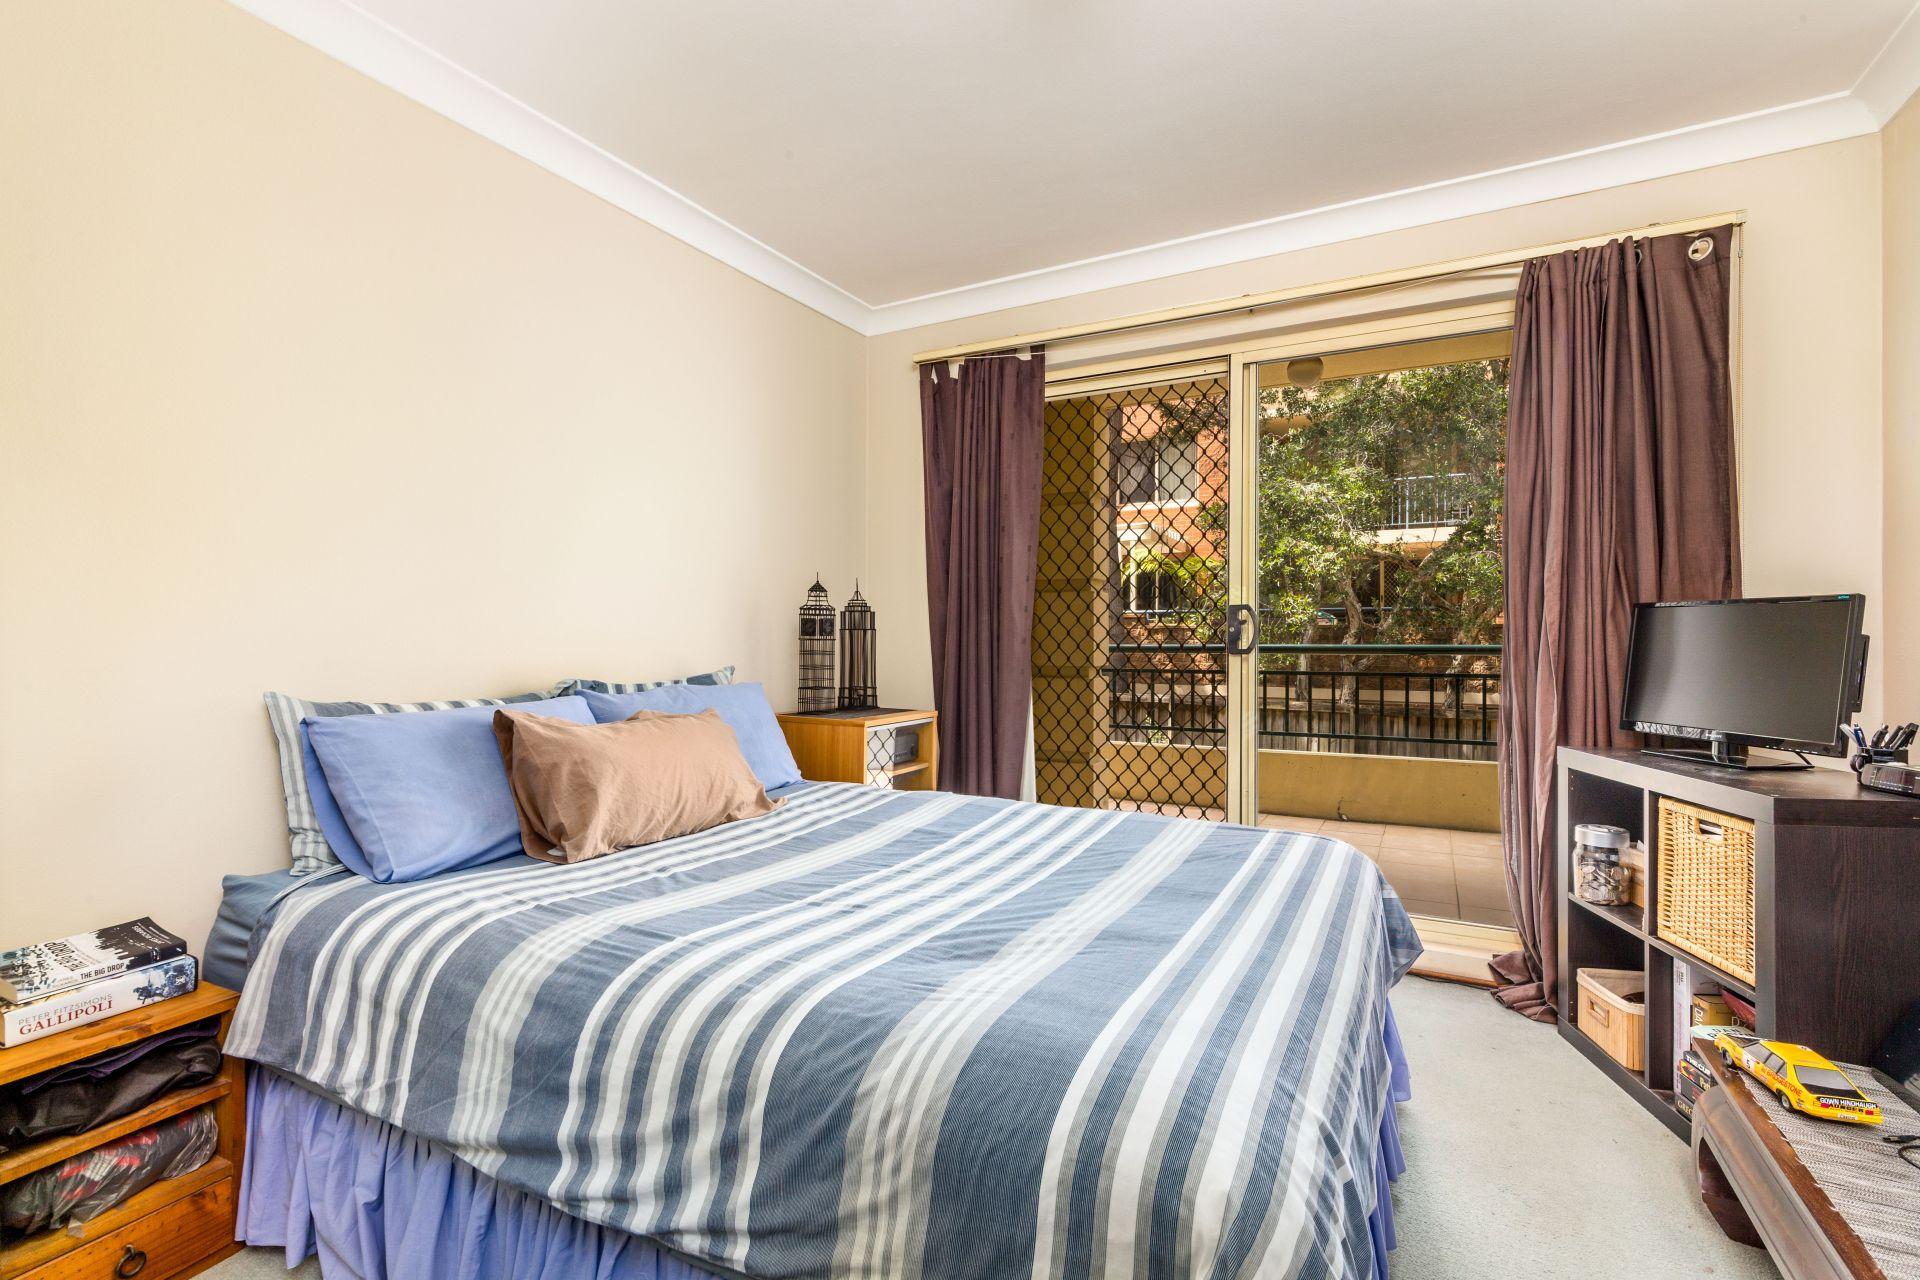 68/23 George Street, North Strathfield NSW 2137